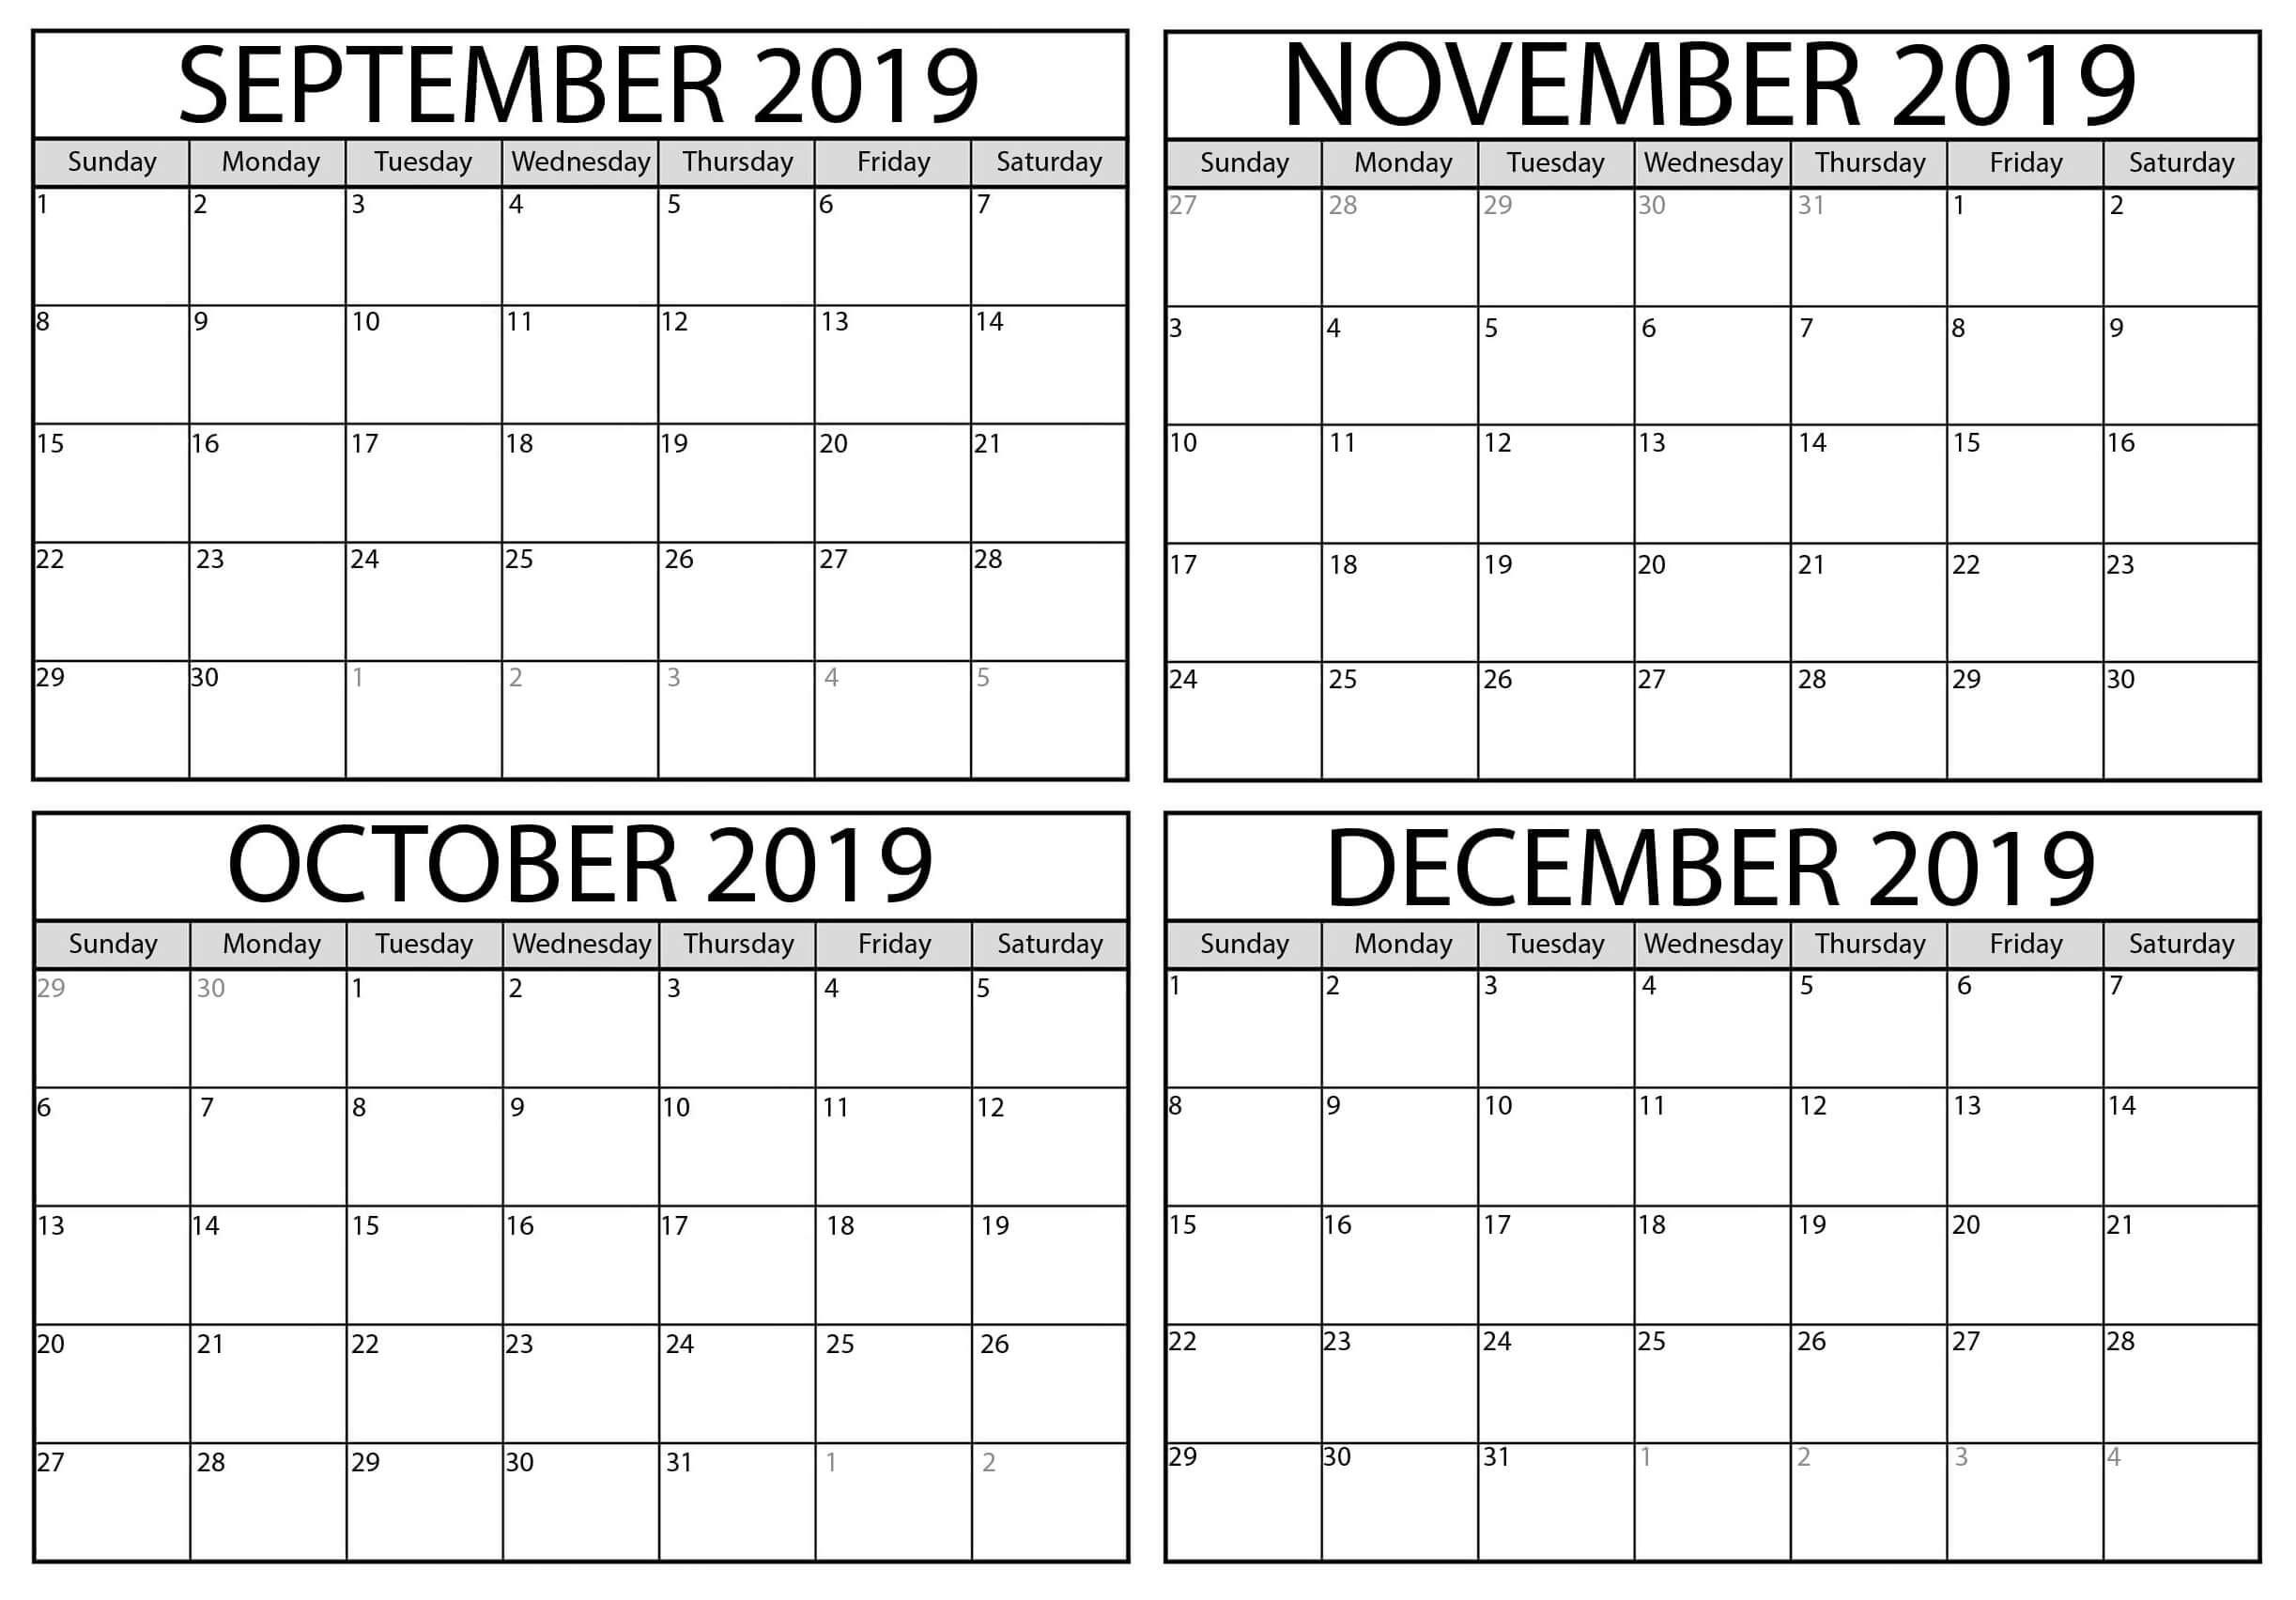 2019 Calender Template | Teekayshippingcorporation